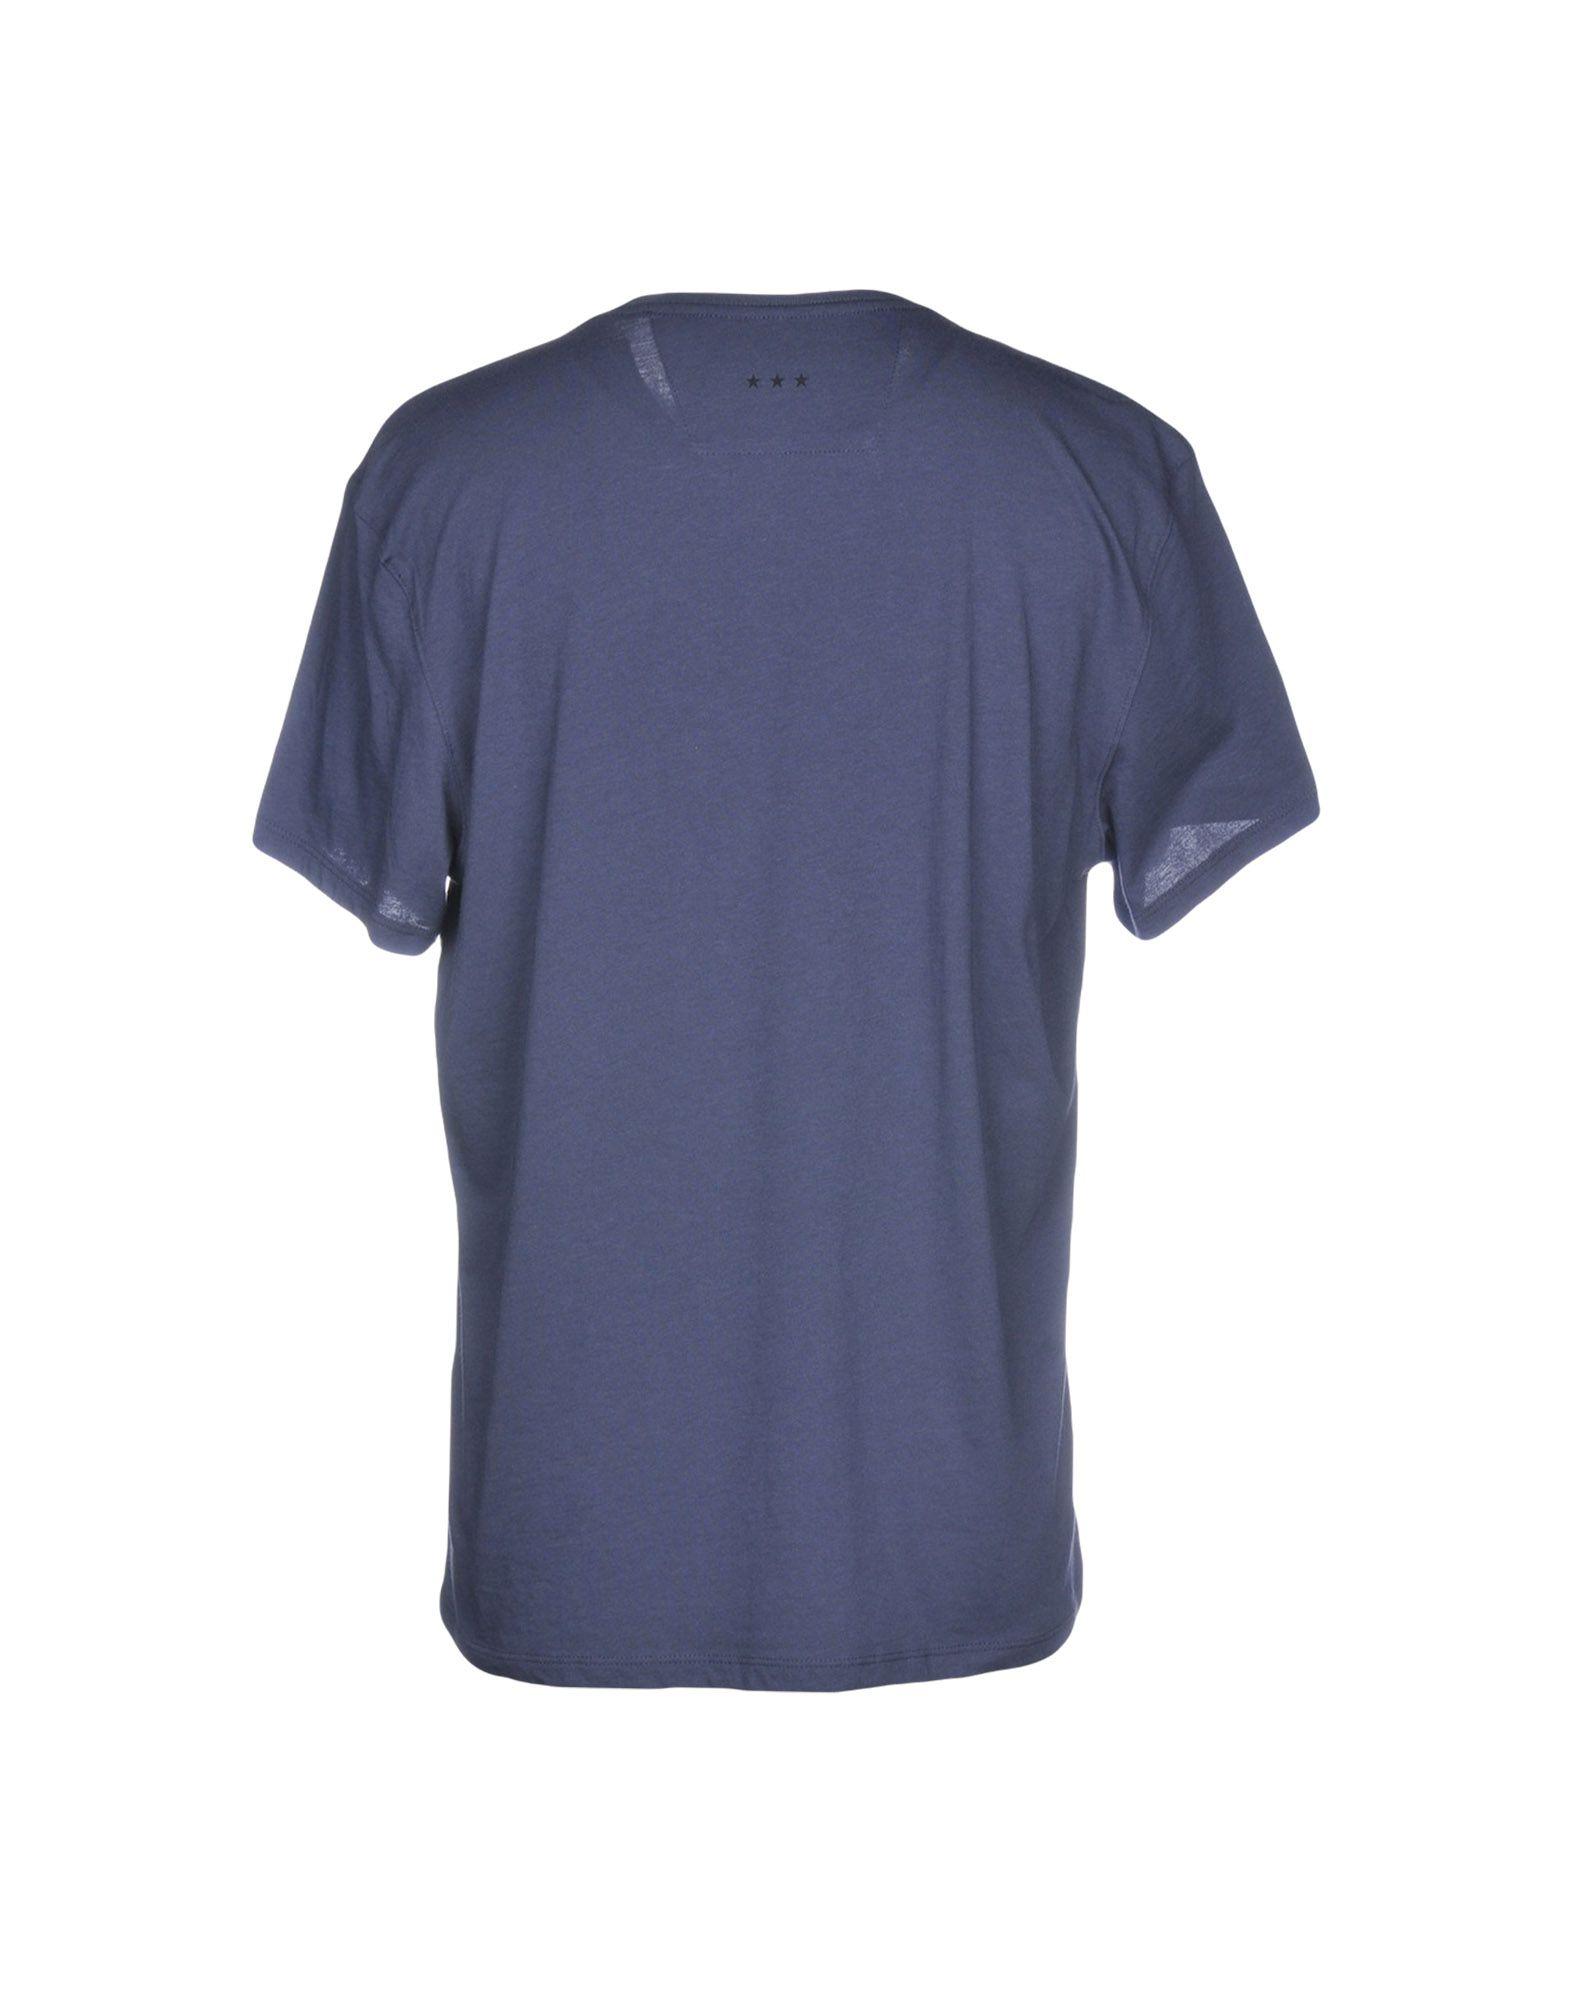 T-Shirt U.S.A. John Varvatos ★ U.S.A. T-Shirt Uomo - 12211548ST 8ced5b